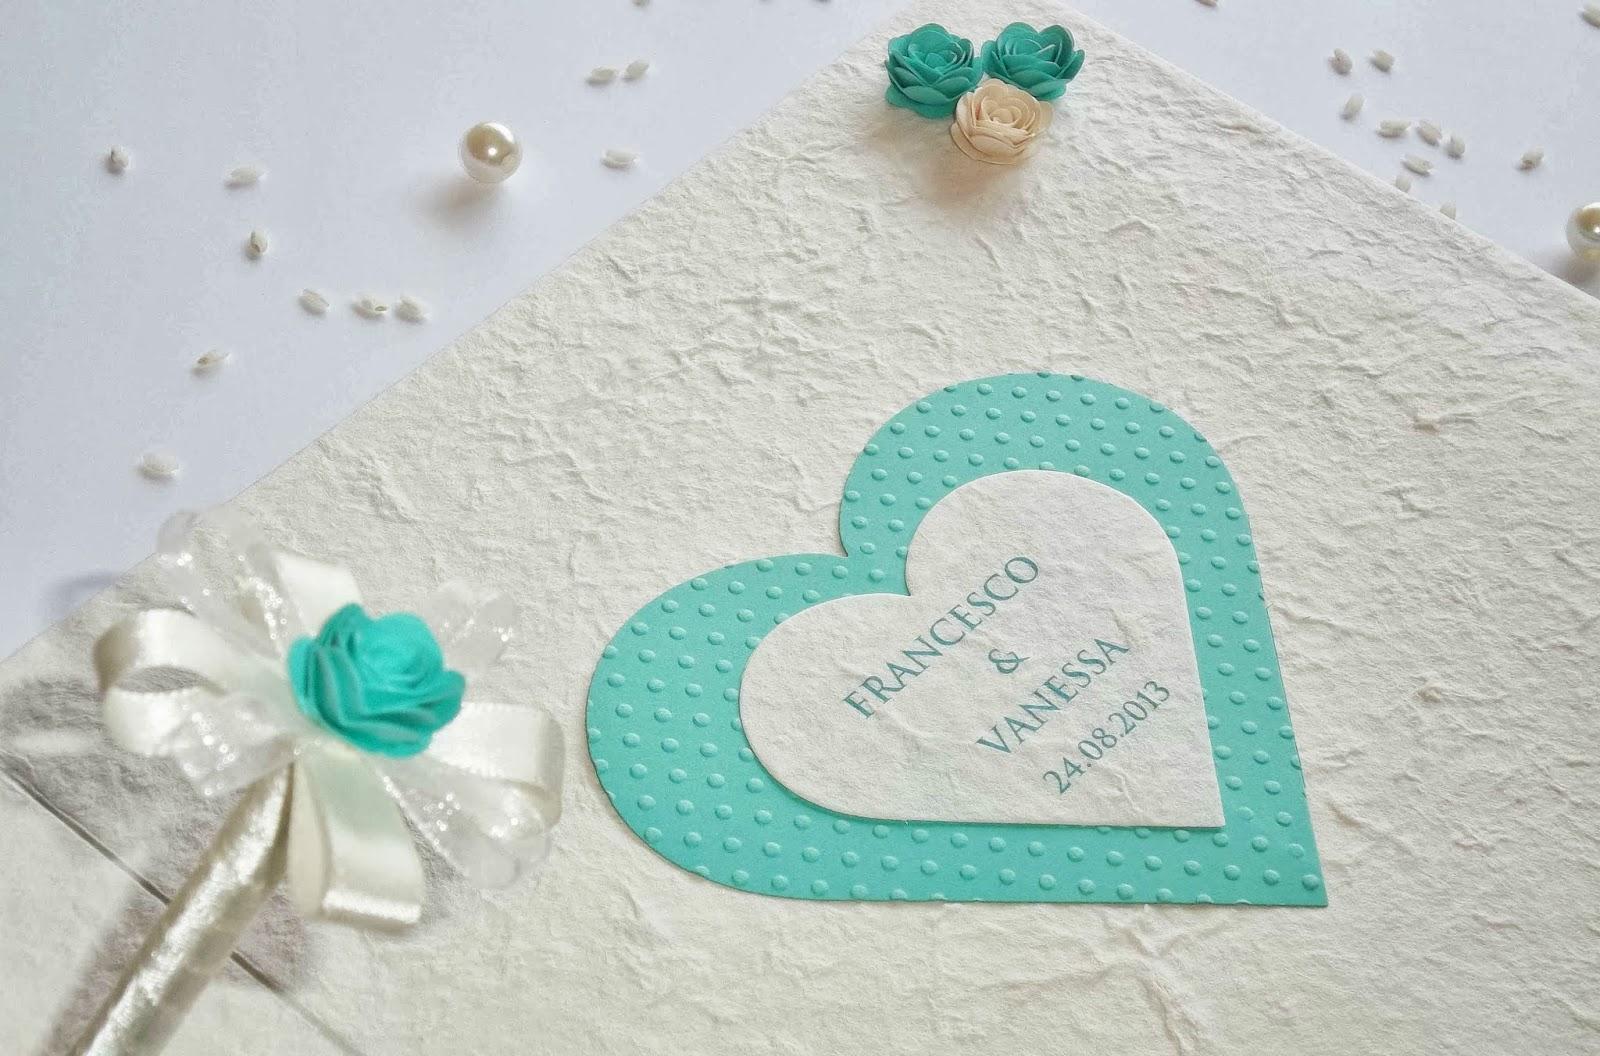 Matrimonio Tema Tiffany : Sara crea matrimonio color tiffany guestbook a tema